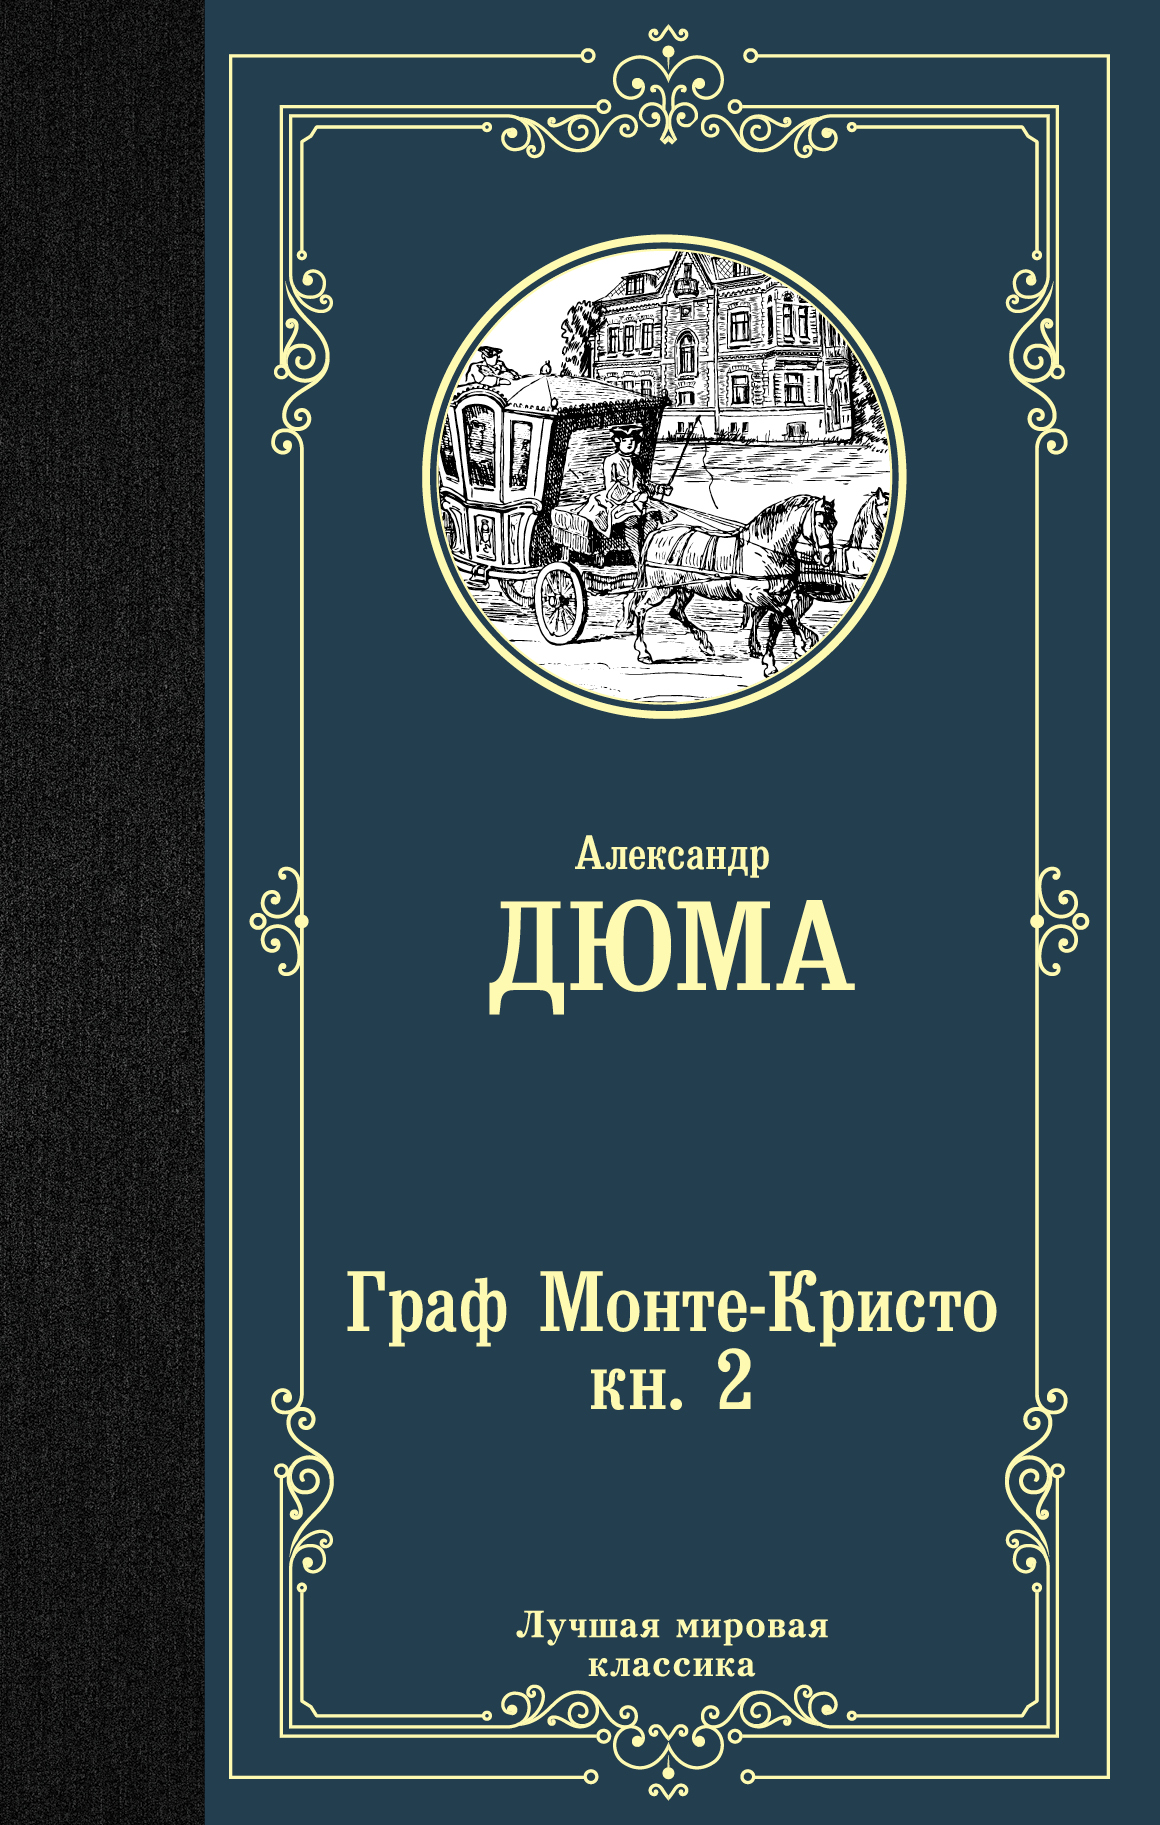 Александр Дюма Граф Монте-Кристо. В 2 кн. Кн. 2